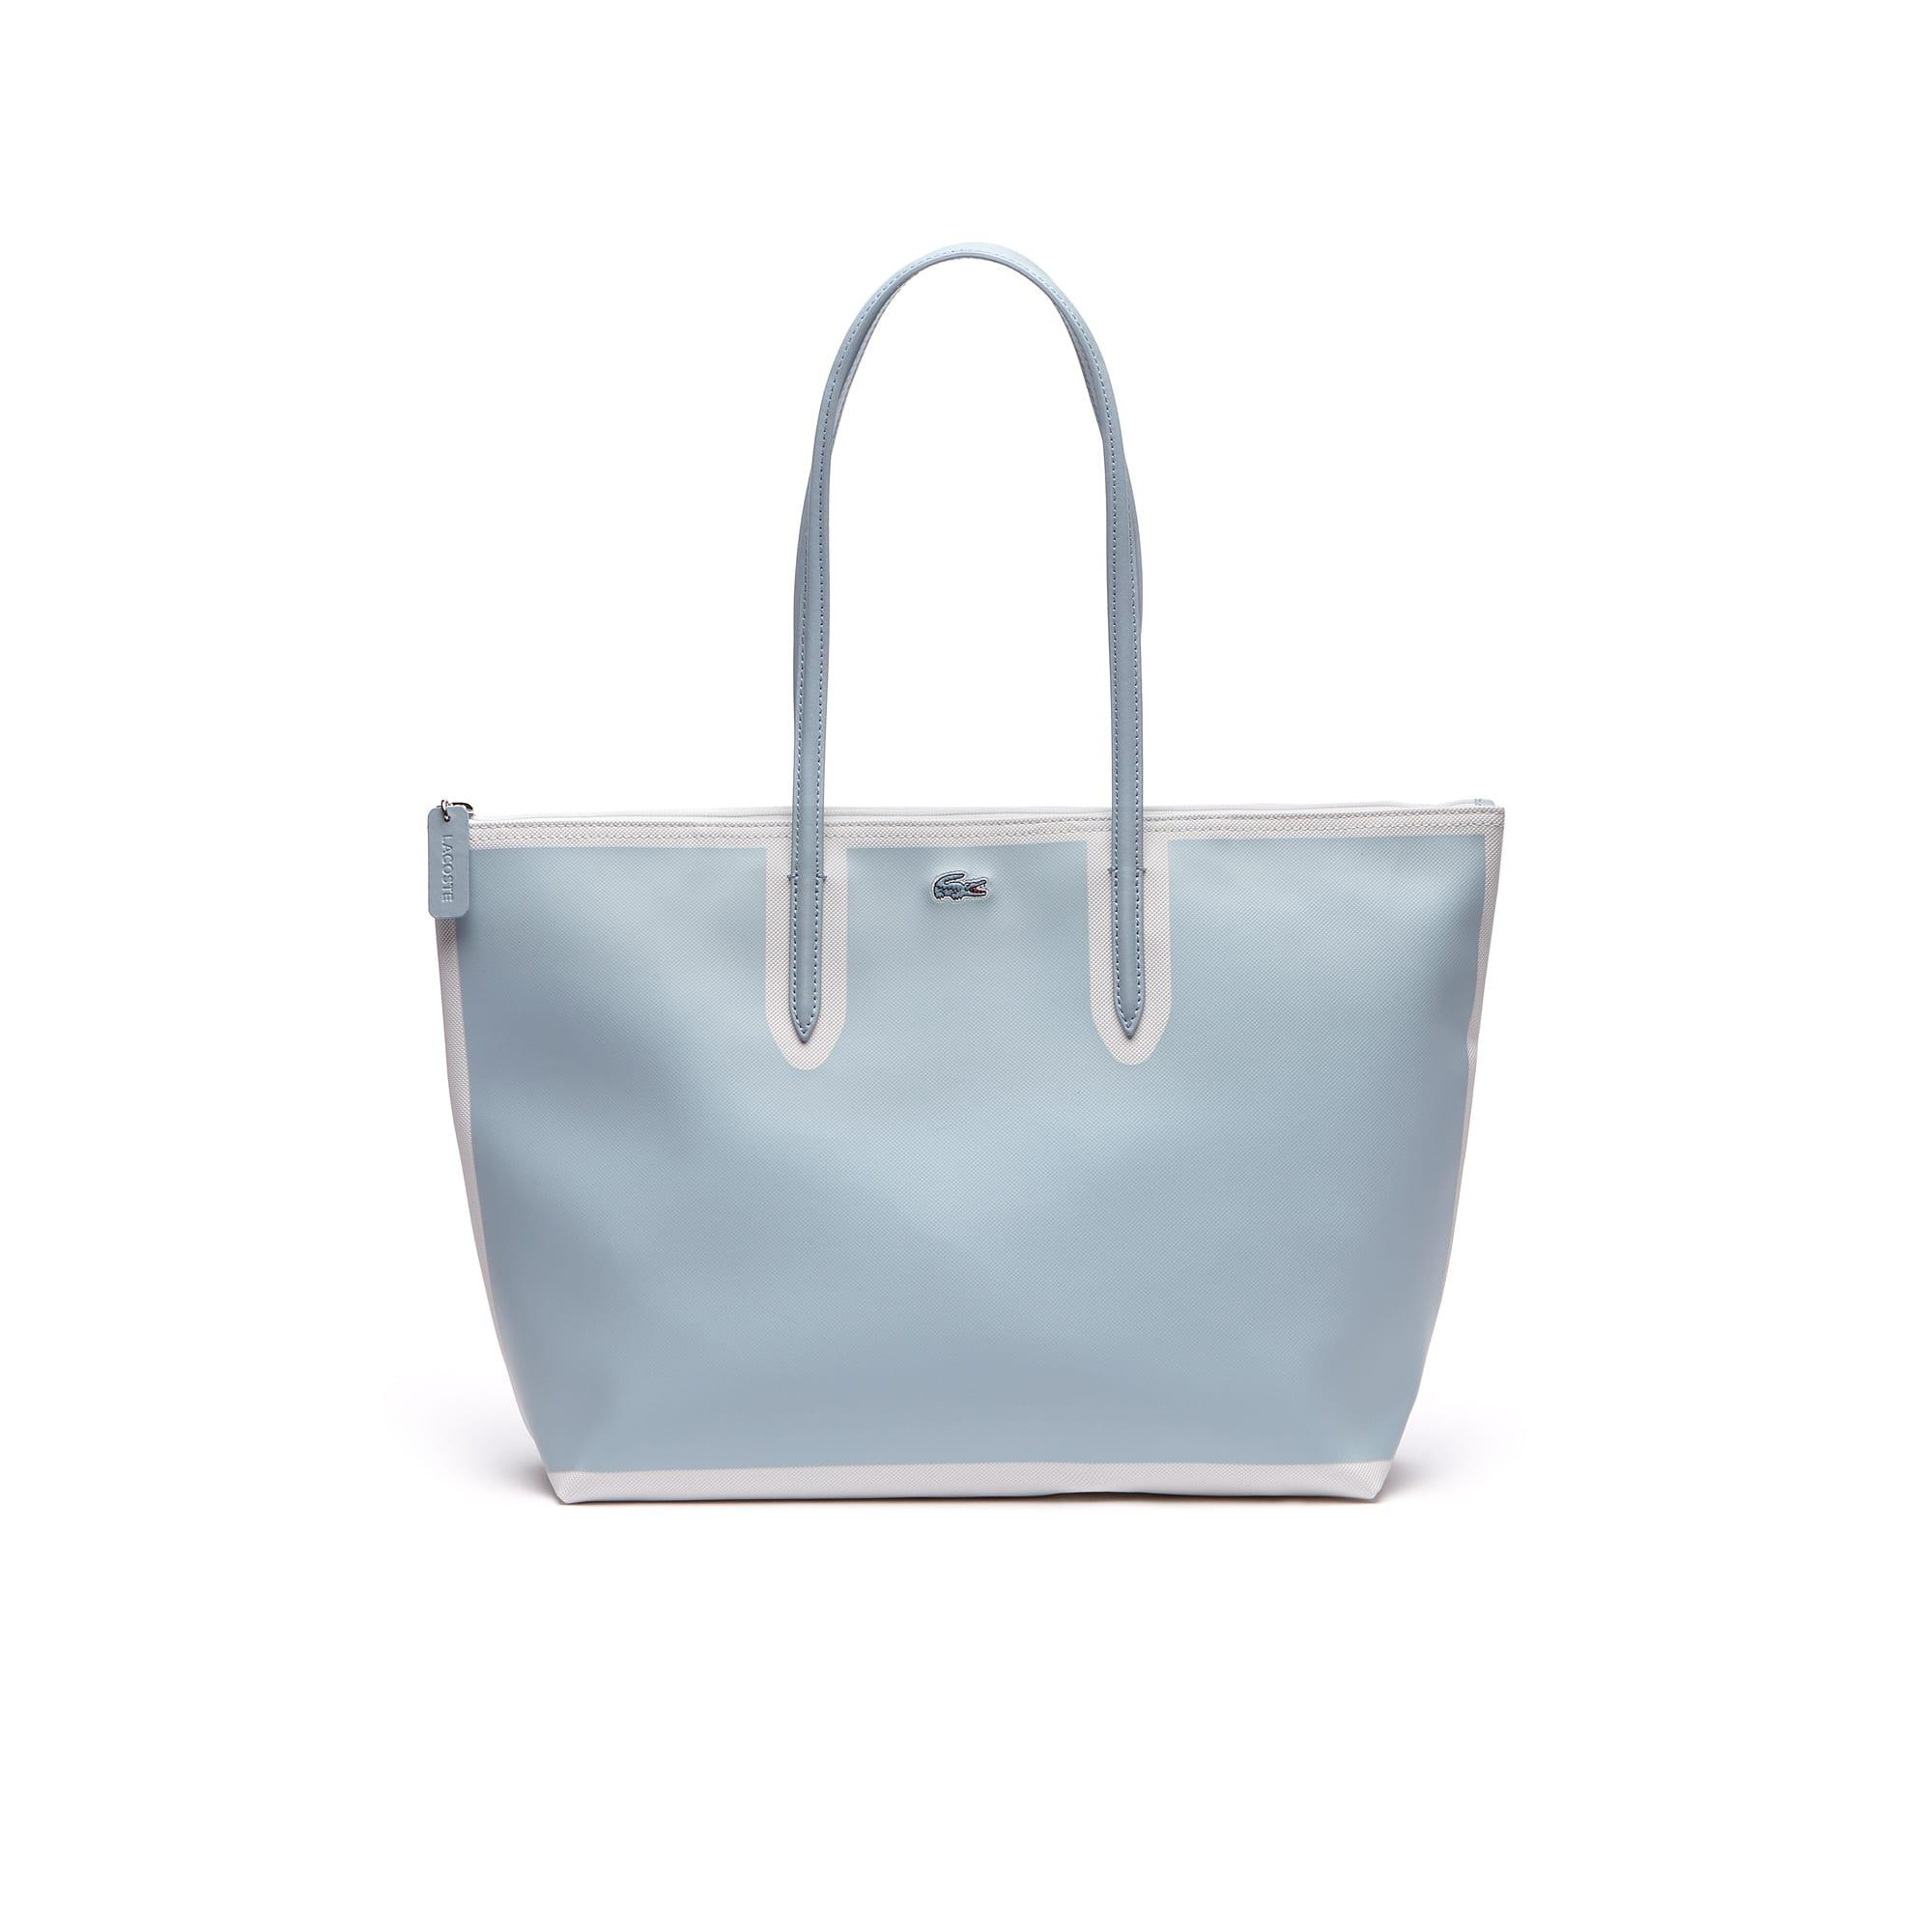 Shopping bag grande con zip L.12.12 Concept in petit piqué color block